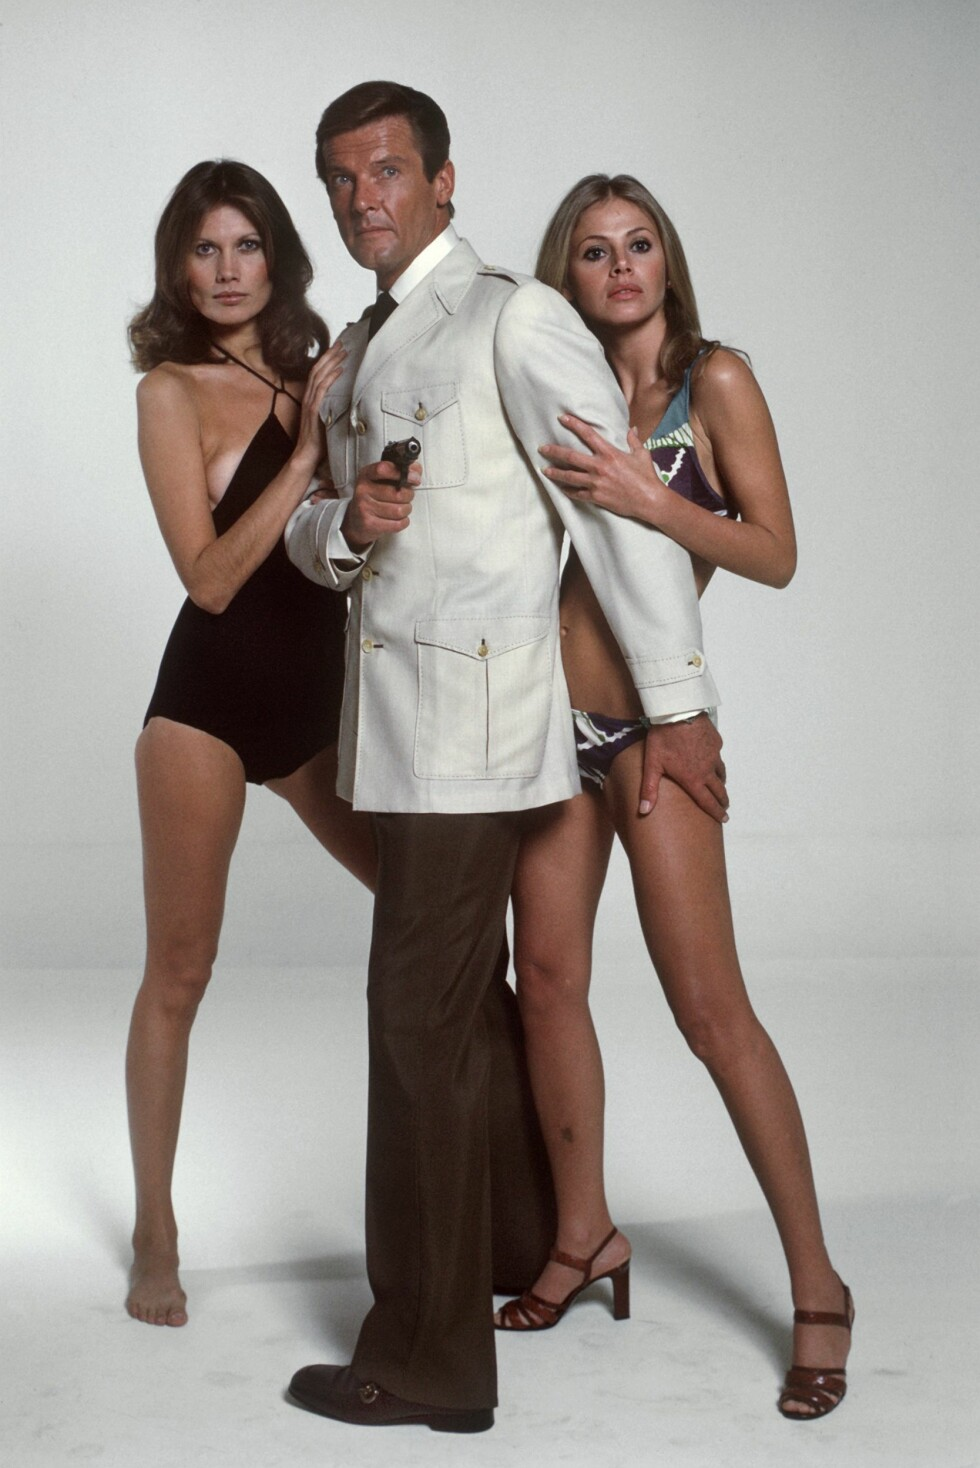 PÅ LERRETET: Fra 1973 til 1985 spilte Roger Moore i syv James Bond-filmer. Her med Maud Adams og Britt Ekland i «The Man with the Golden Gun» fra 1974. Foto: DPA